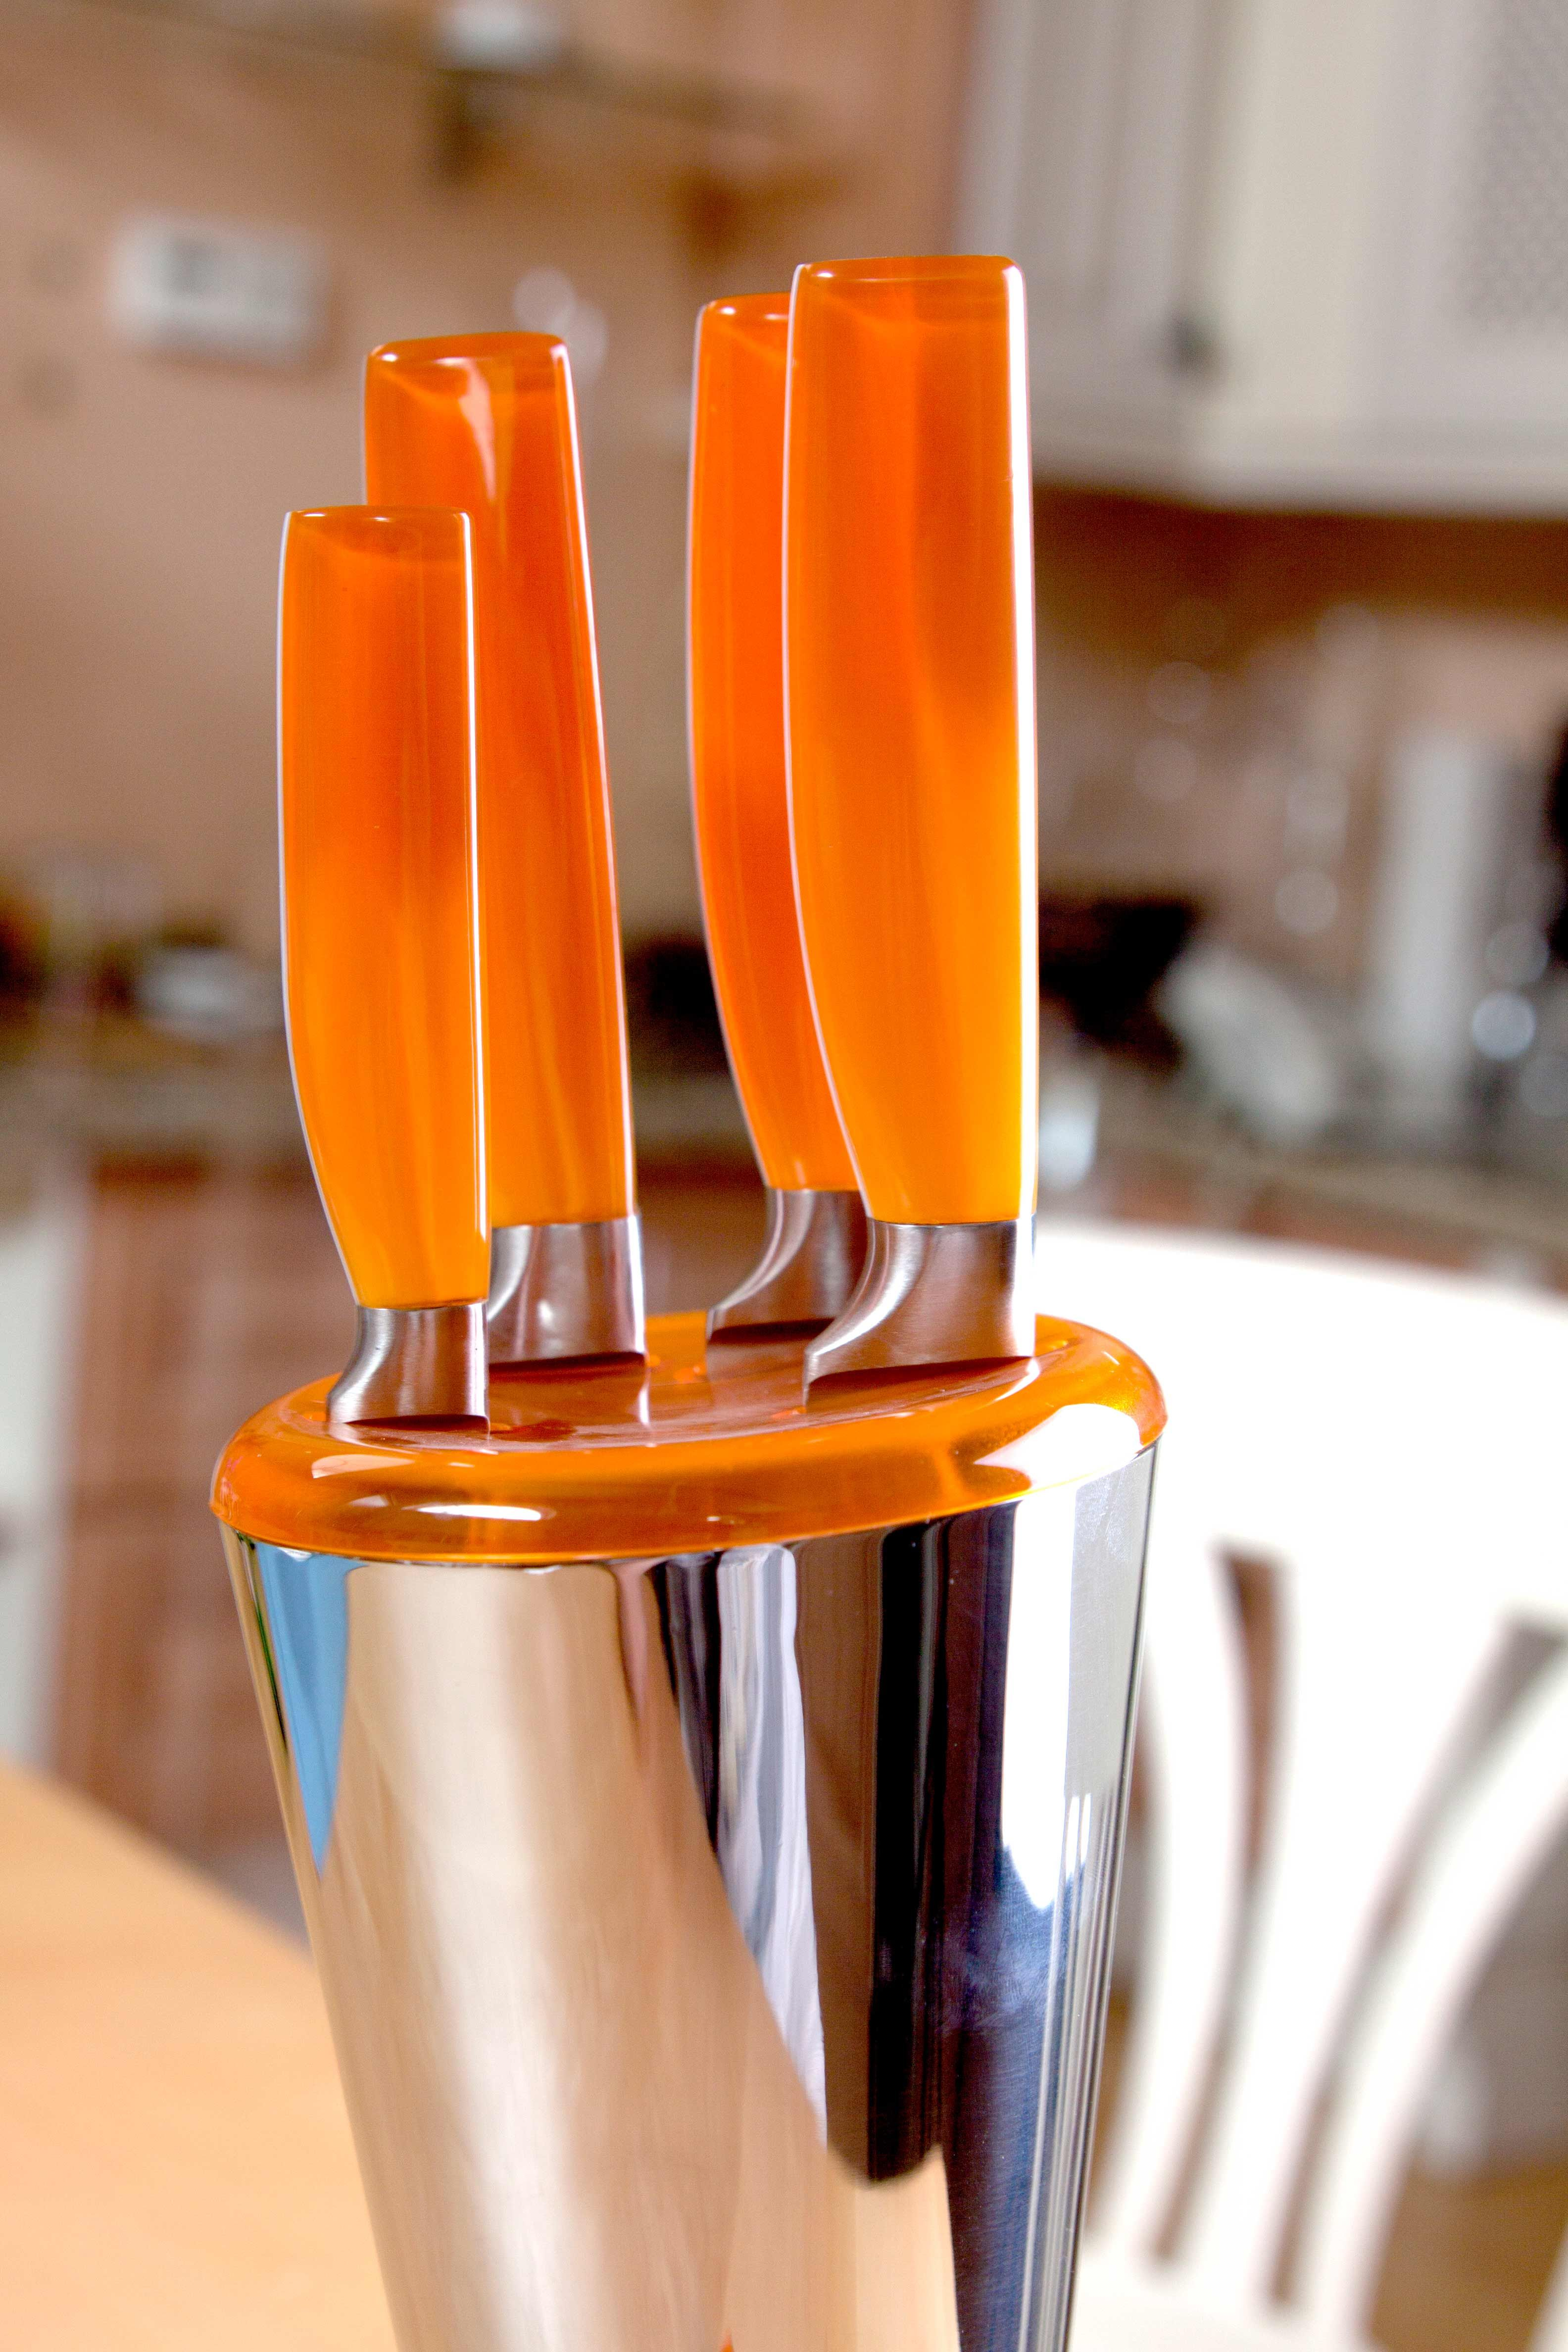 orange knife block set from italian designers guzzini orange